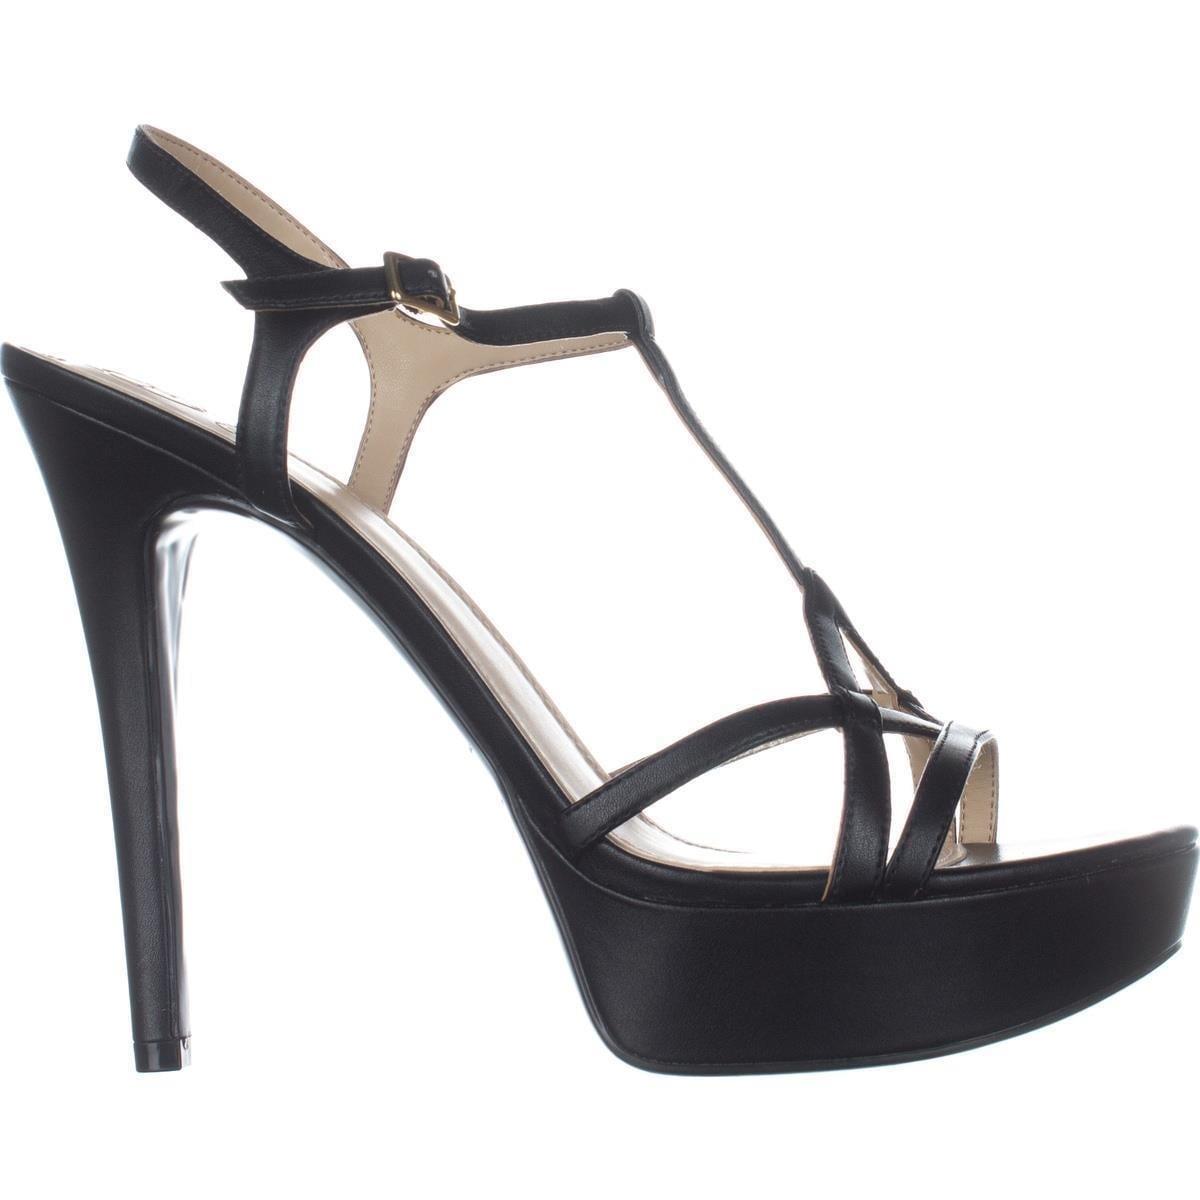 0fe2257558f78a Shop Guess Keiry3 T-Strap Platform Sandals